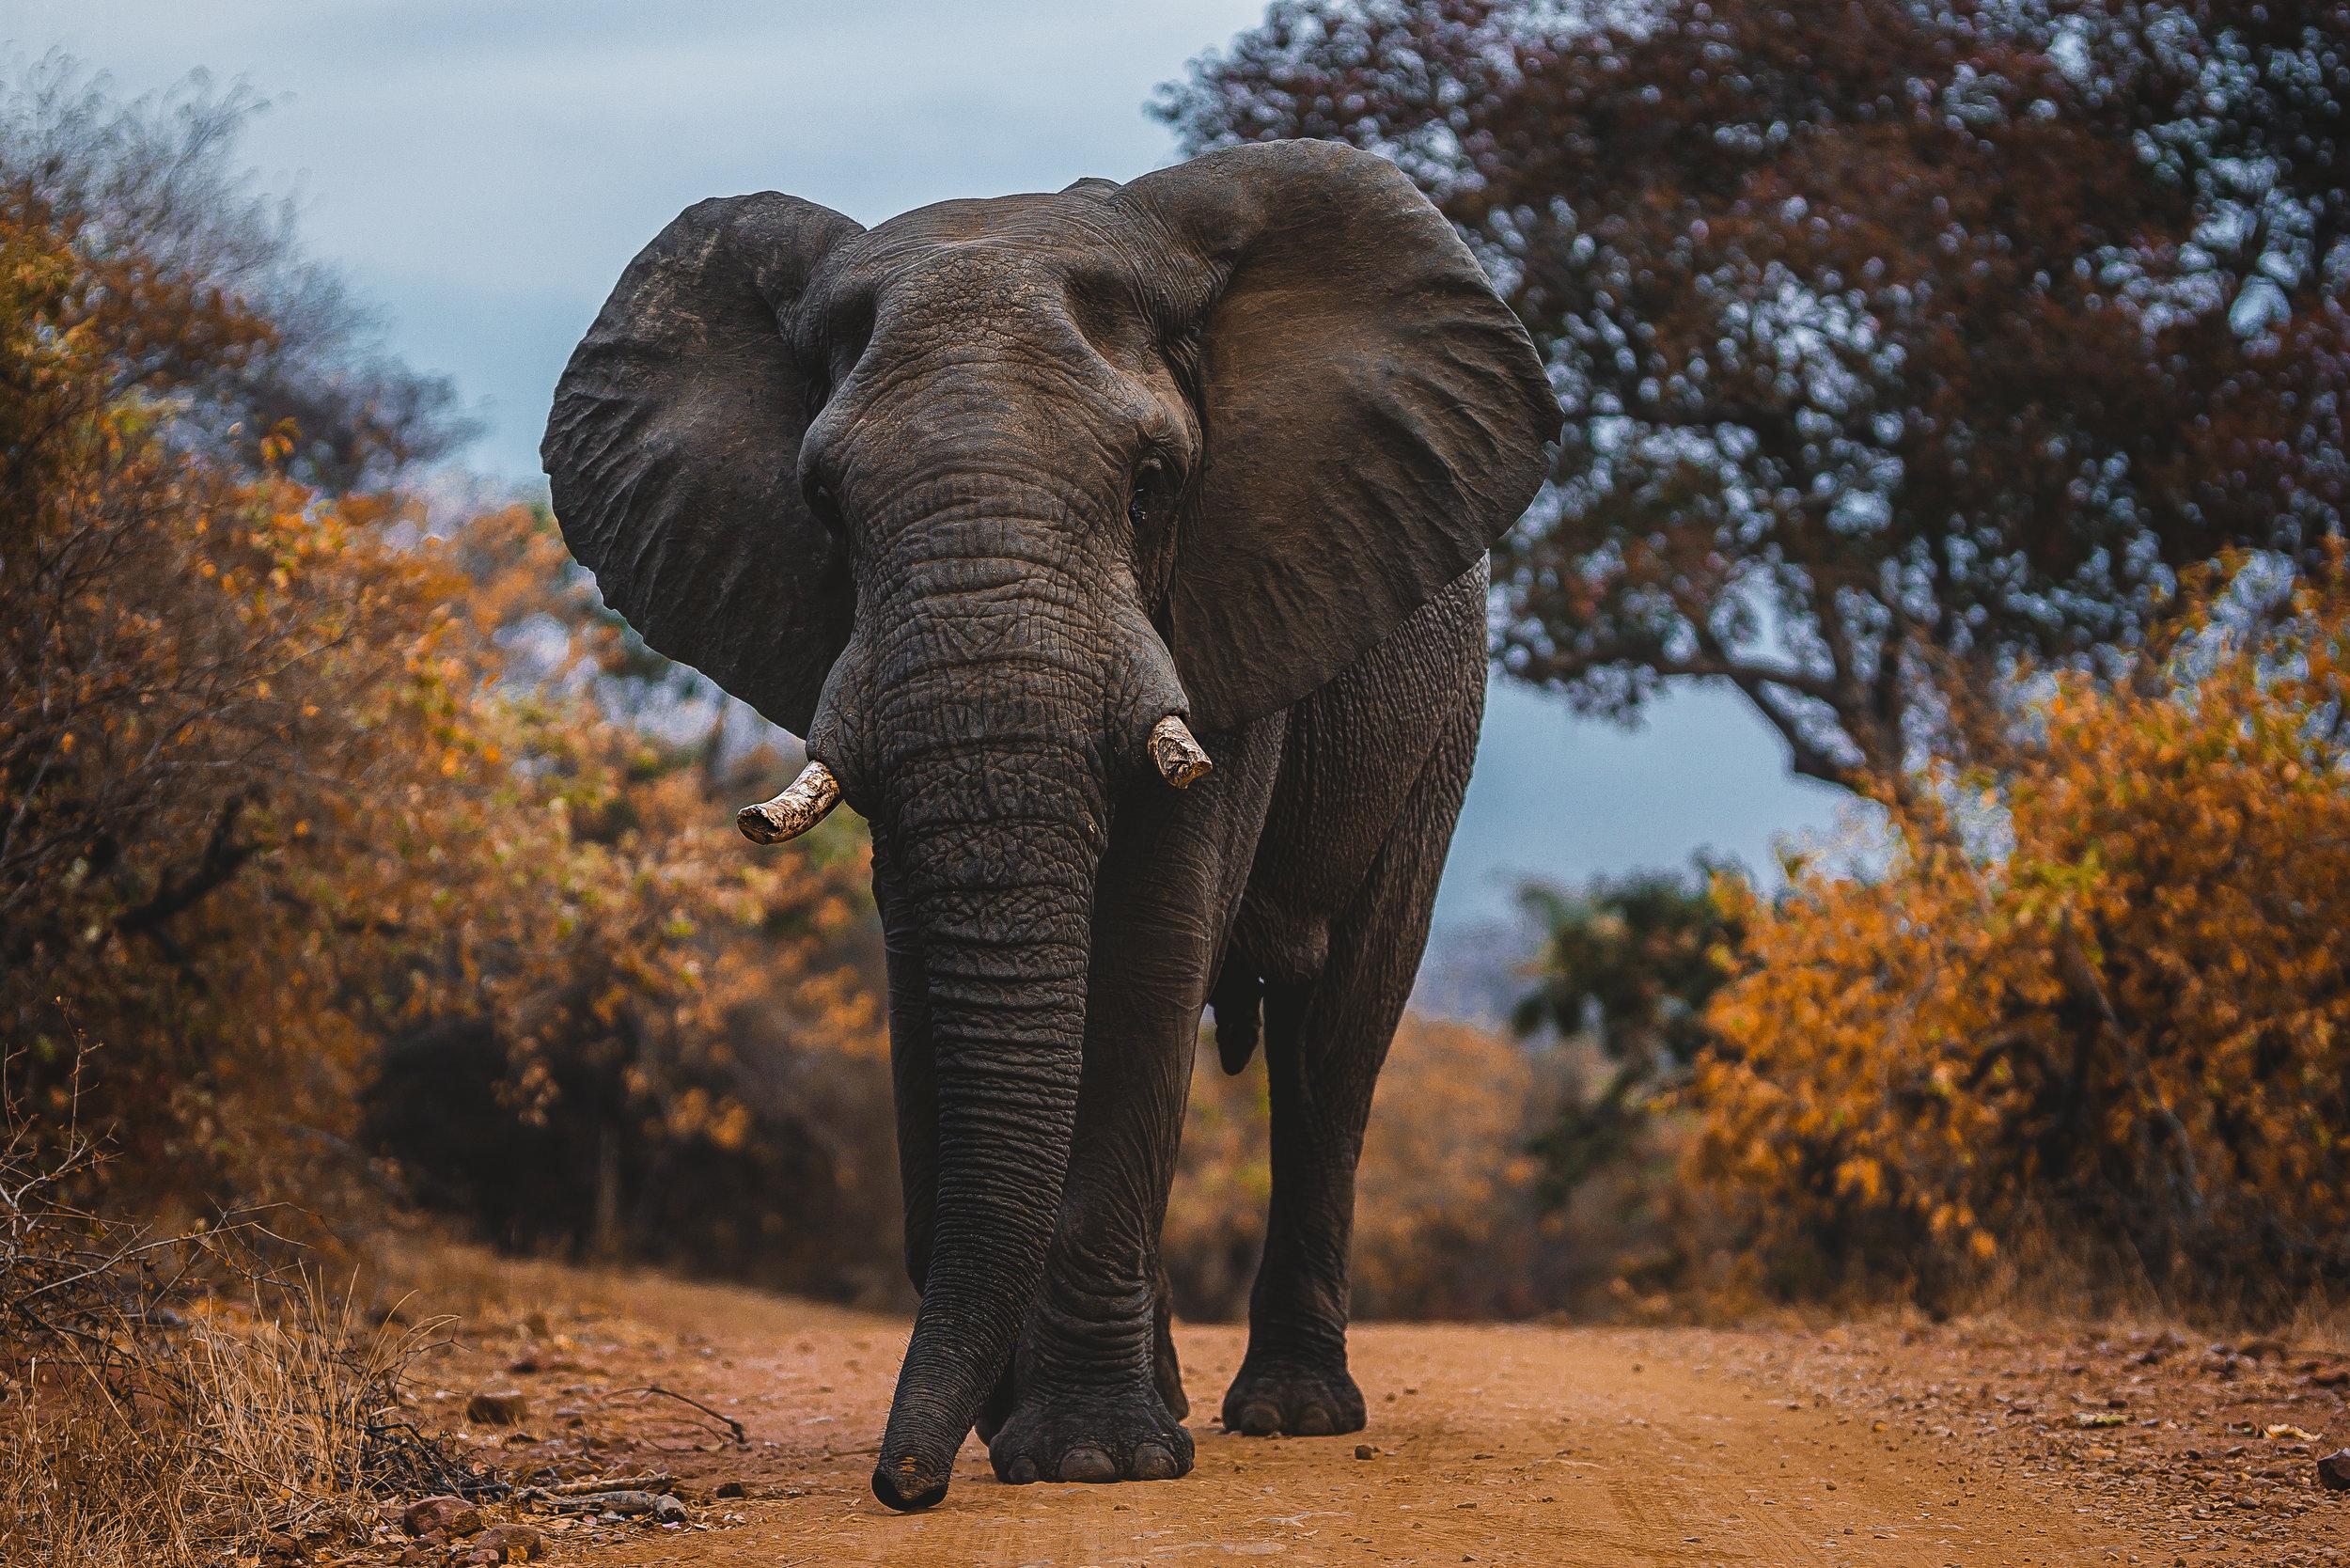 Landscapes by Jason Lanier Photography-Africa 2019-0021 (1).jpg